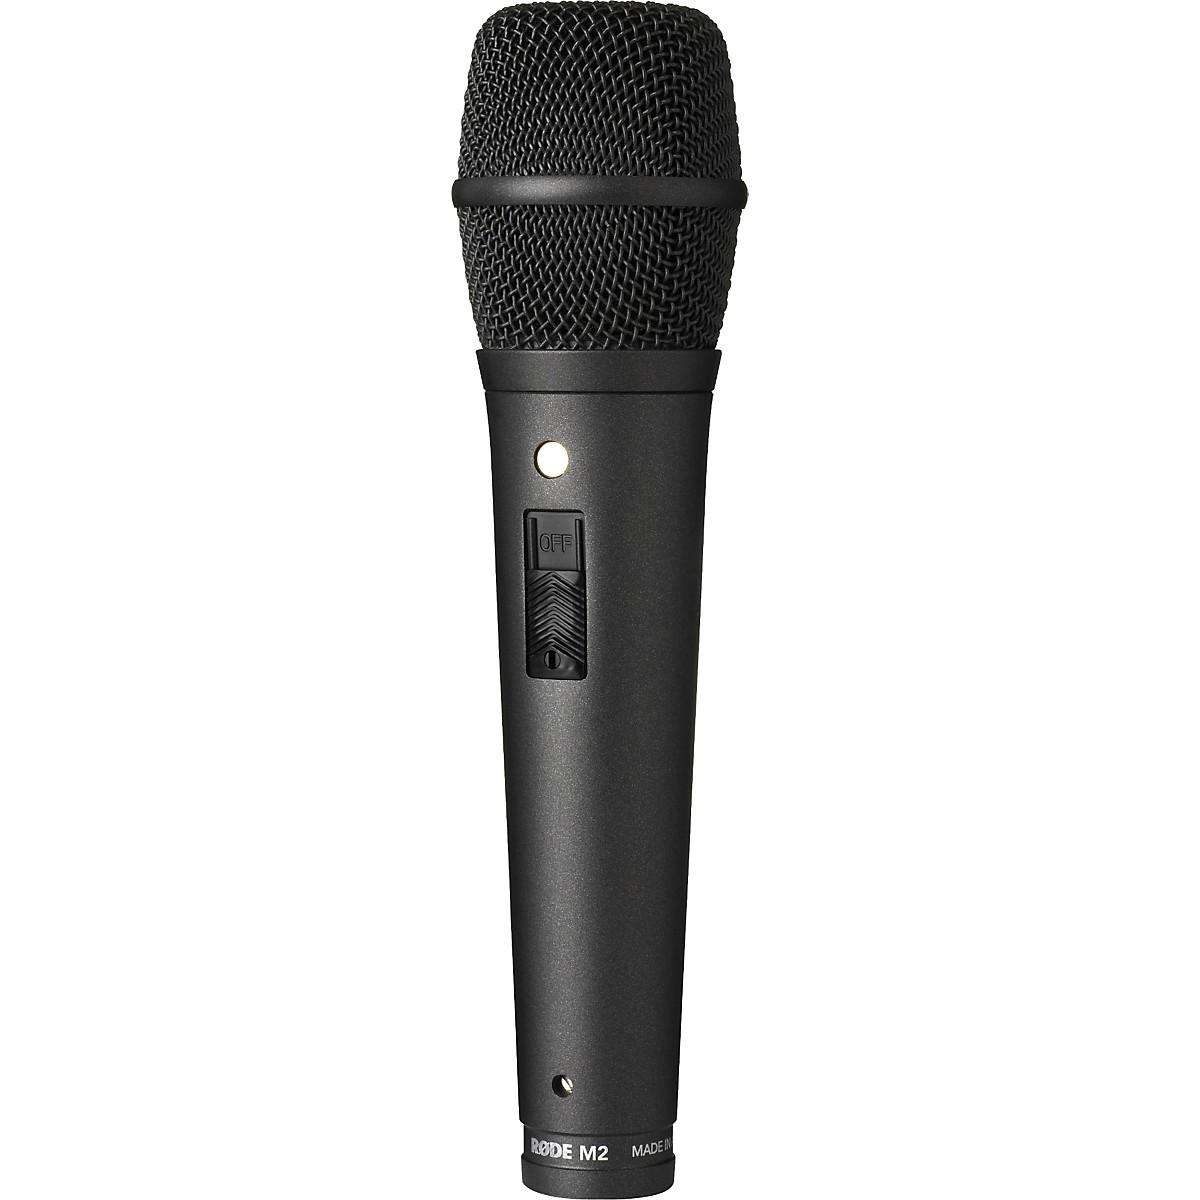 Rode M2 Handheld Condenser Microphone